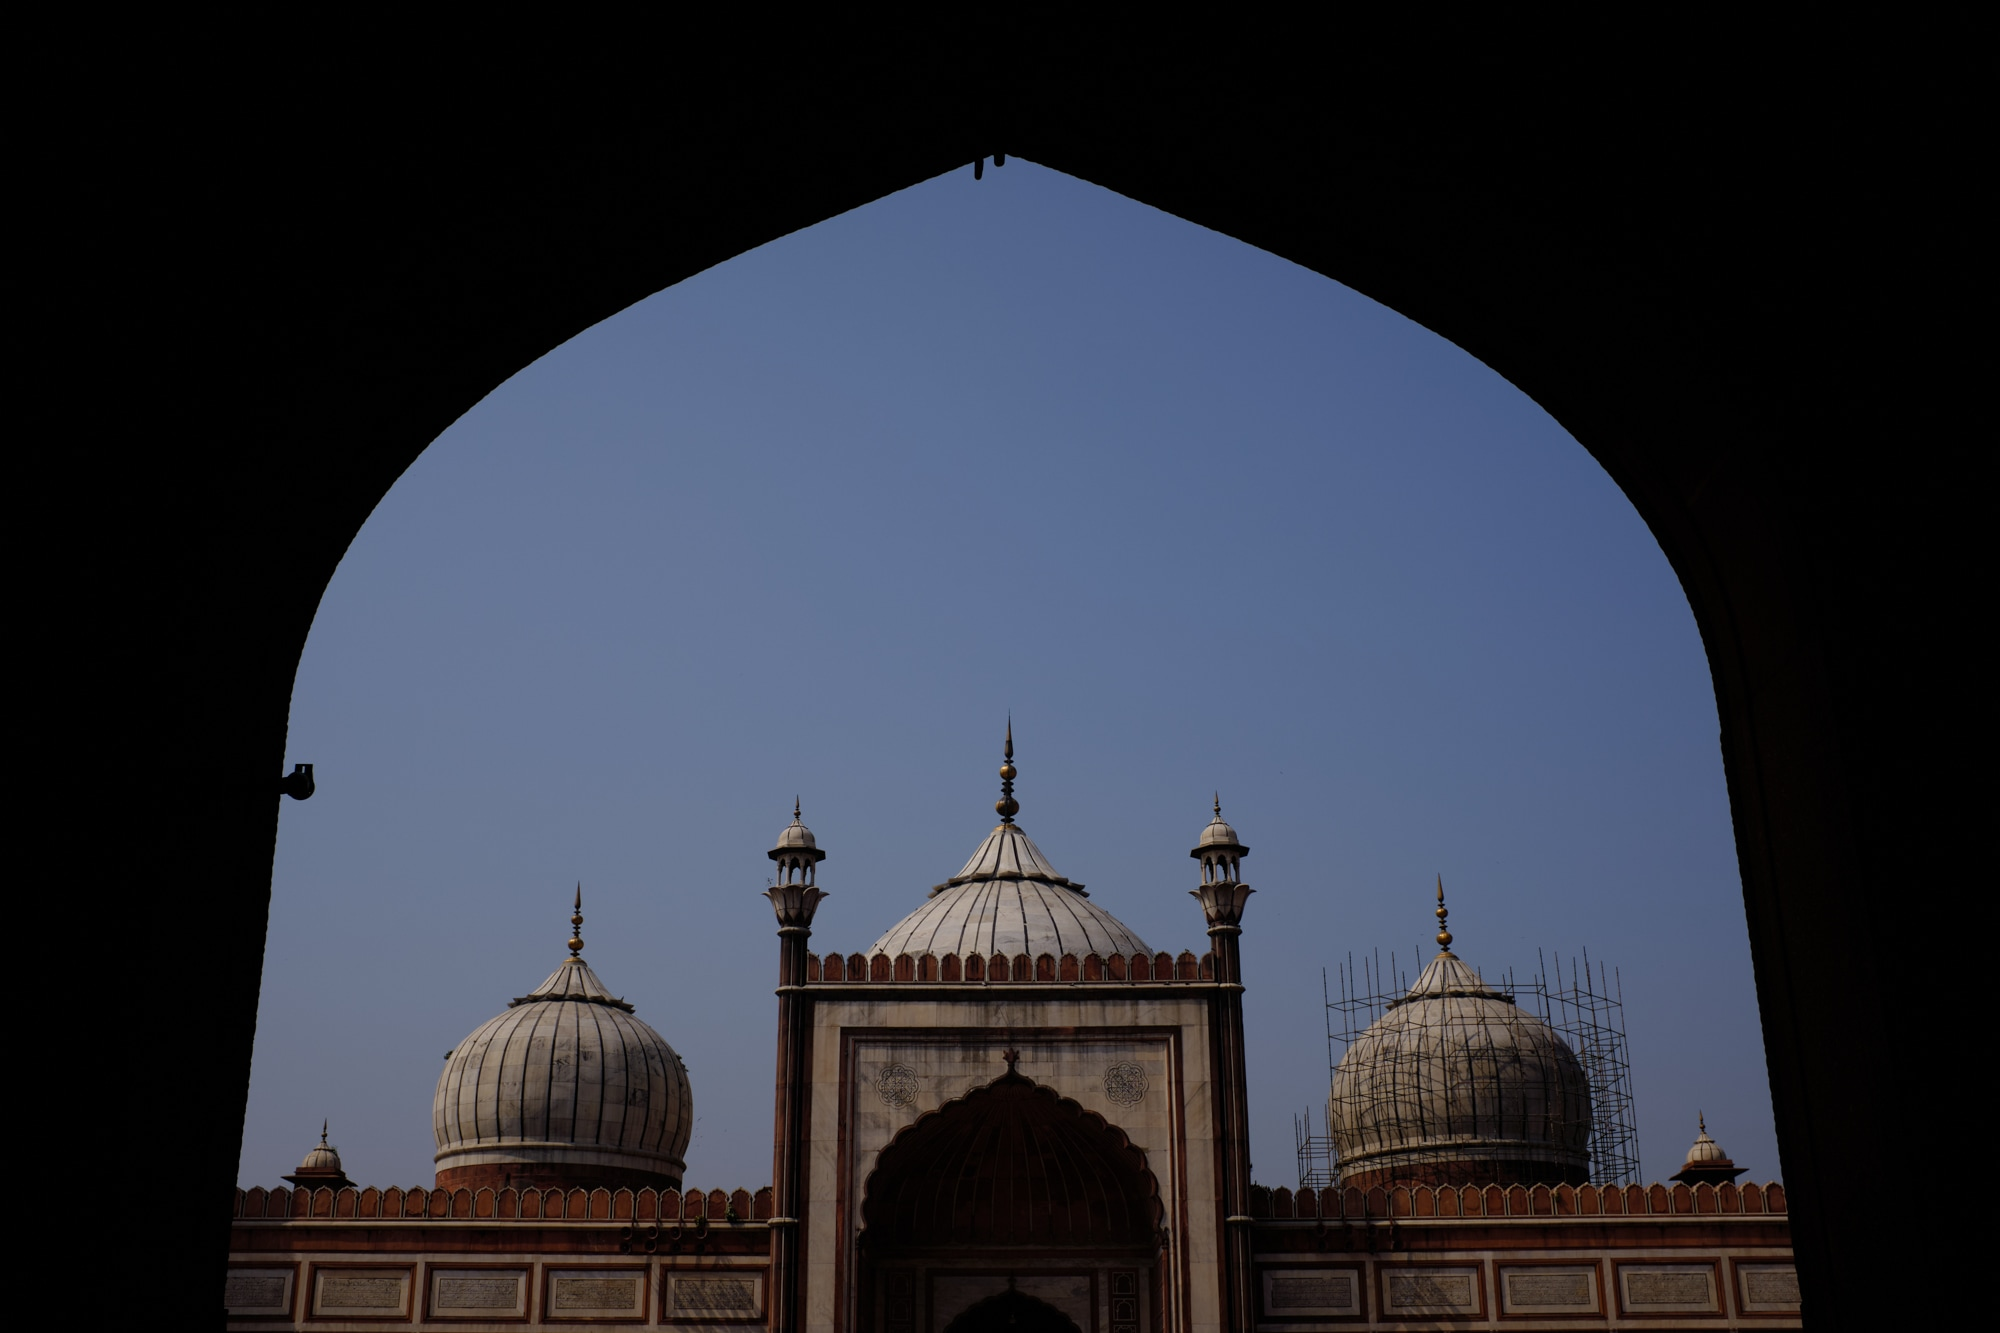 The Jama Mosque of Delhi